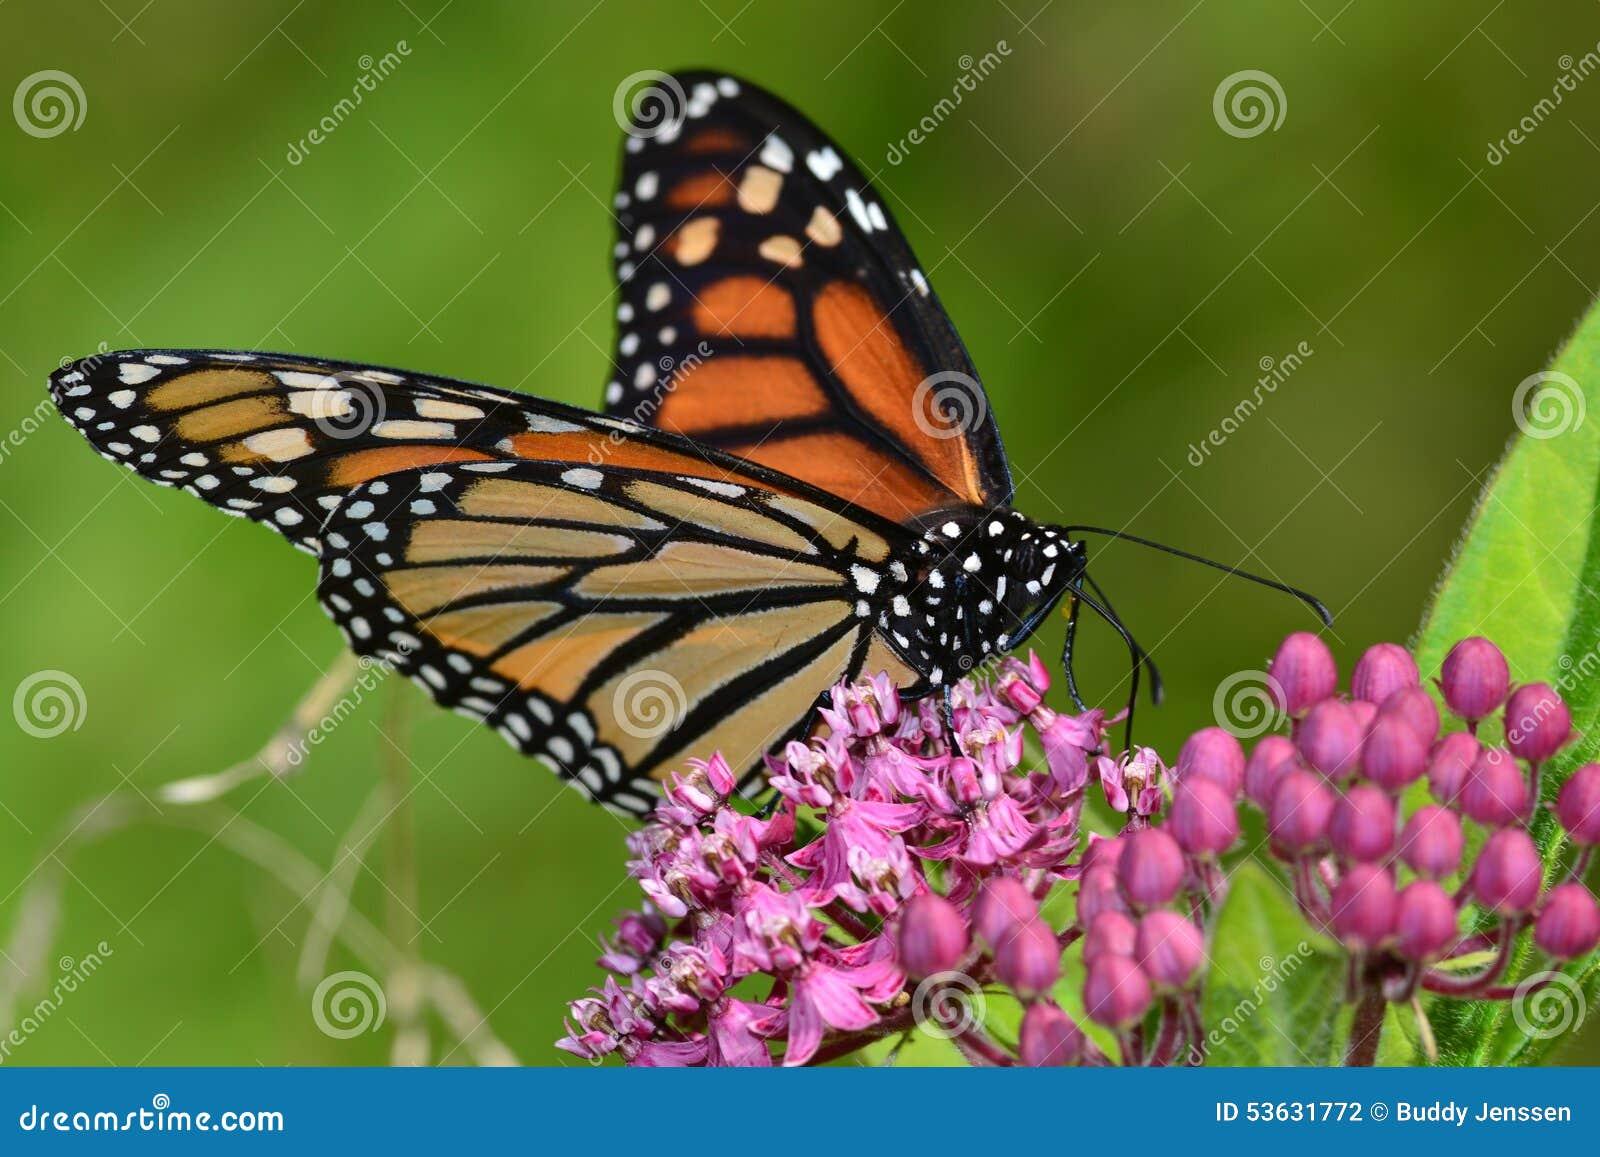 Monarch Butterfly On Pink Kolanchoe Stock Photo